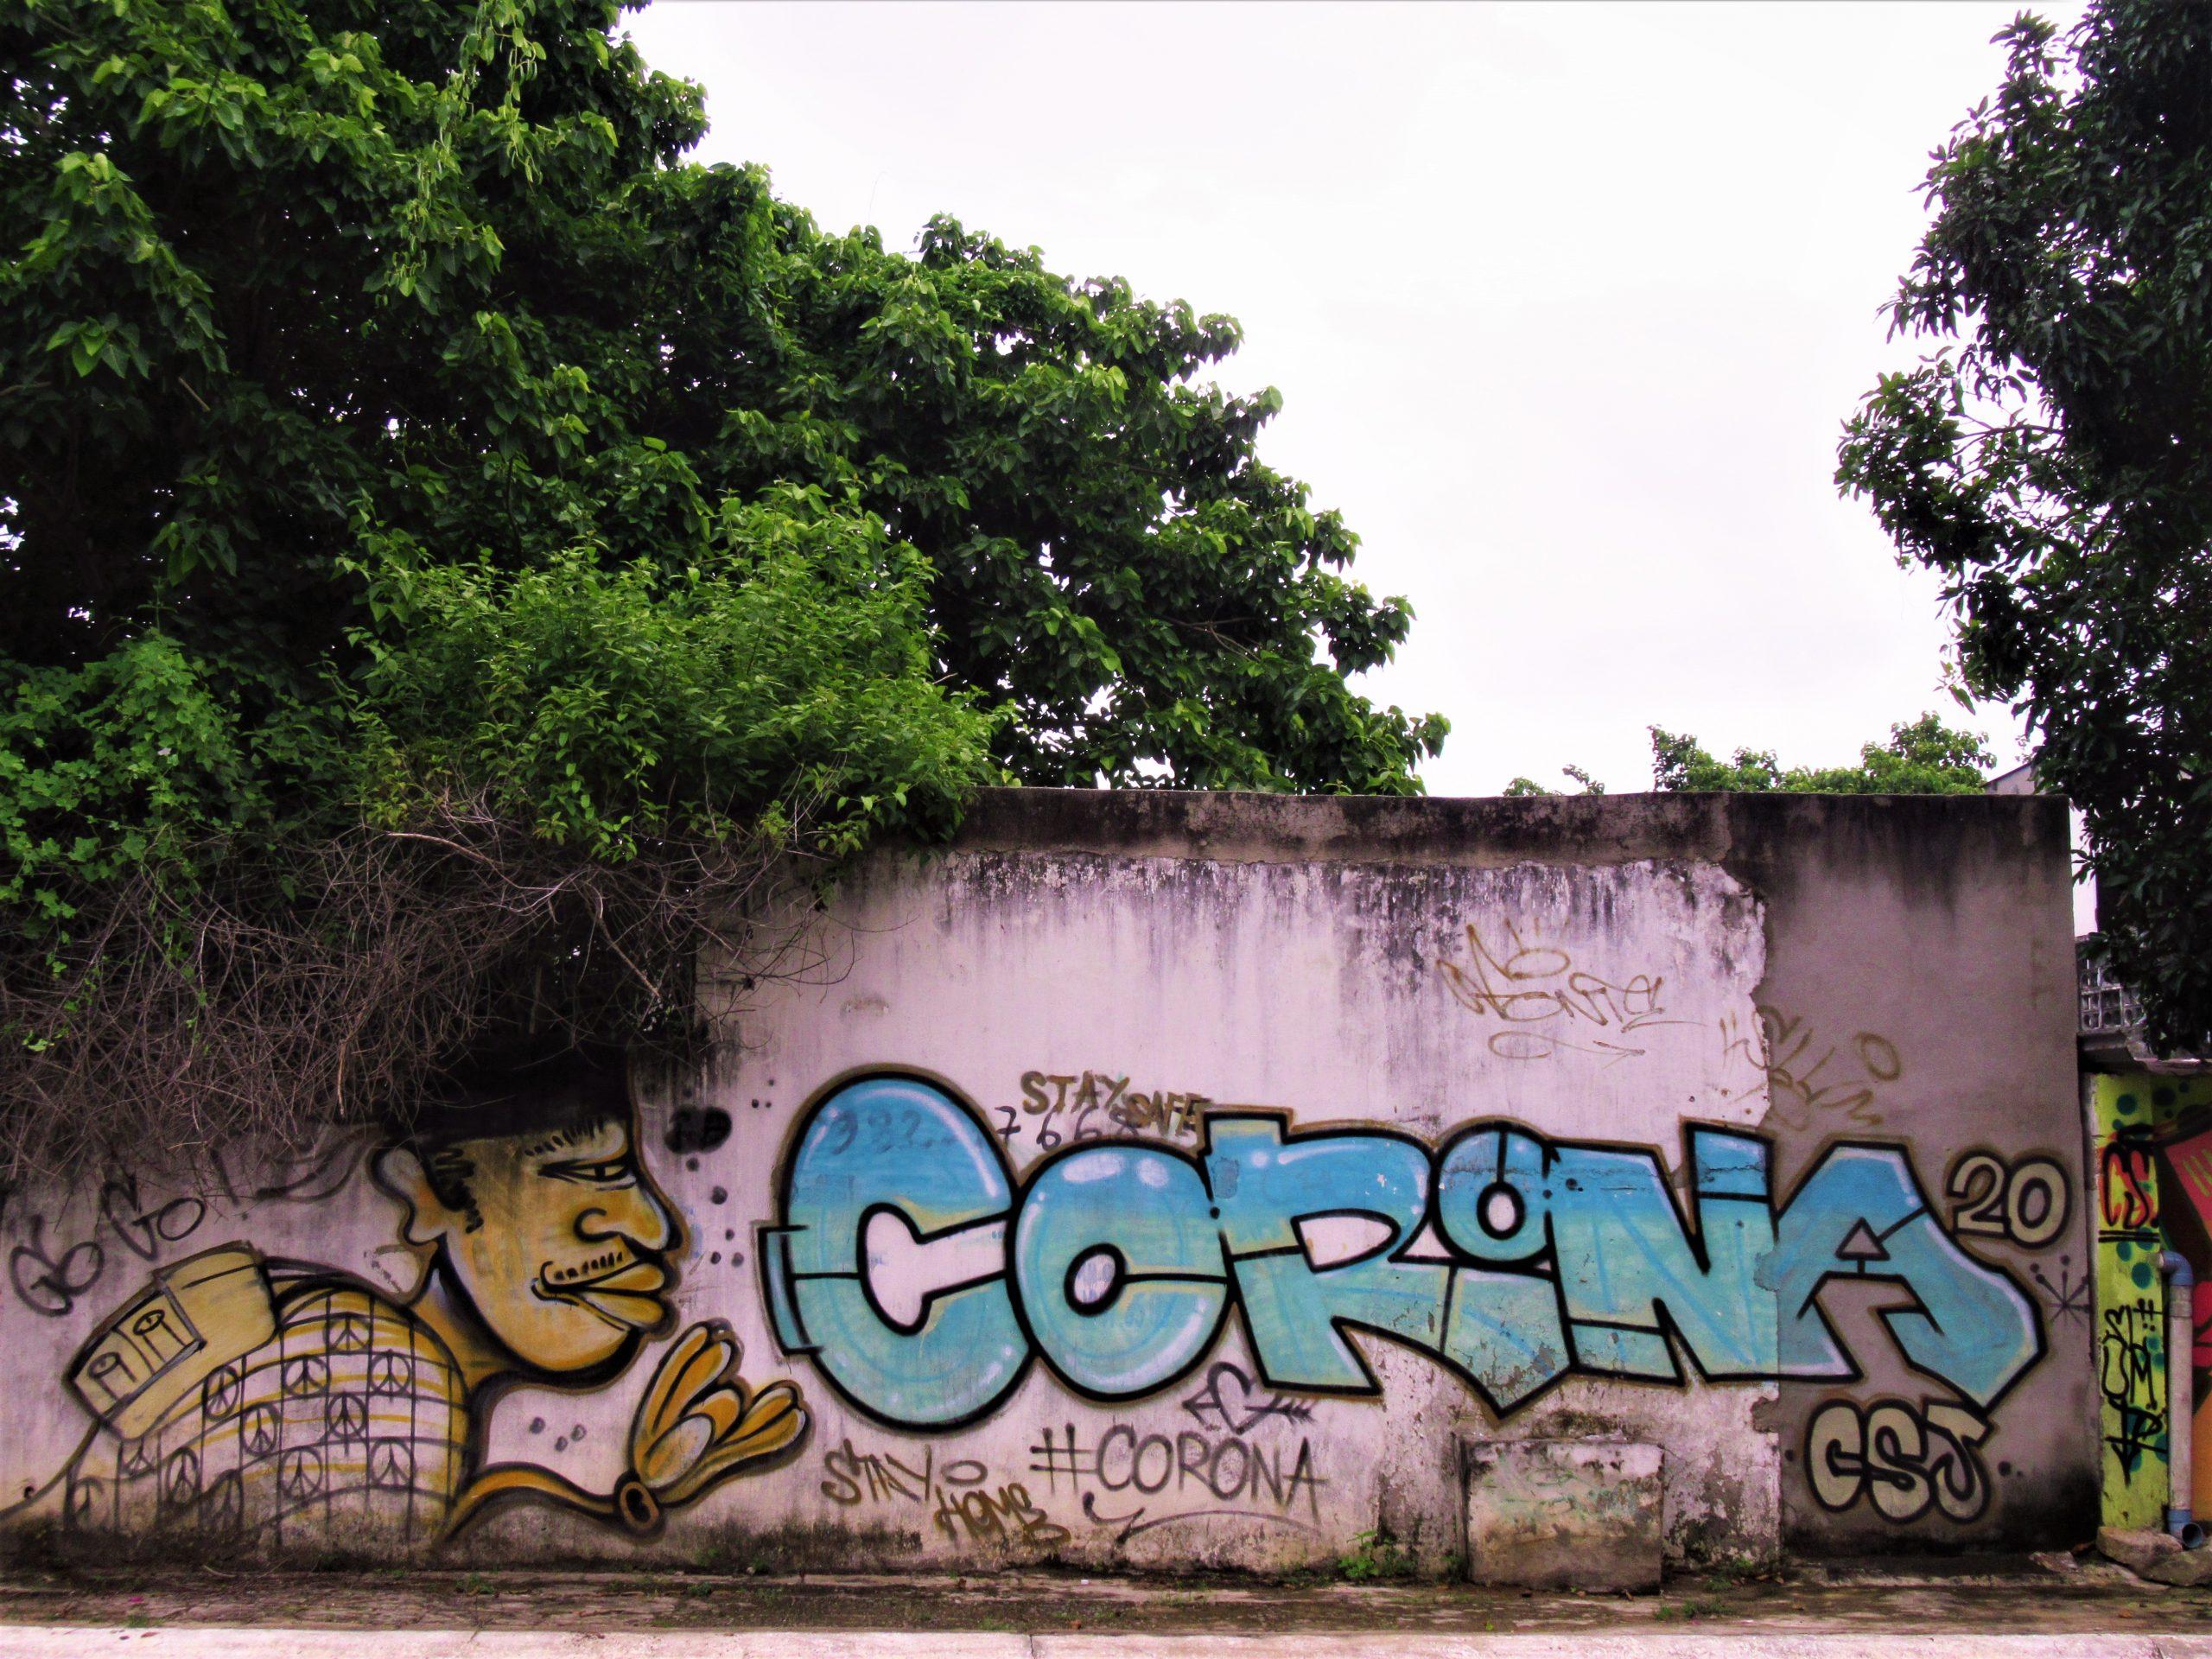 Coronavirus graffiti, Vung Tau, Vietnam